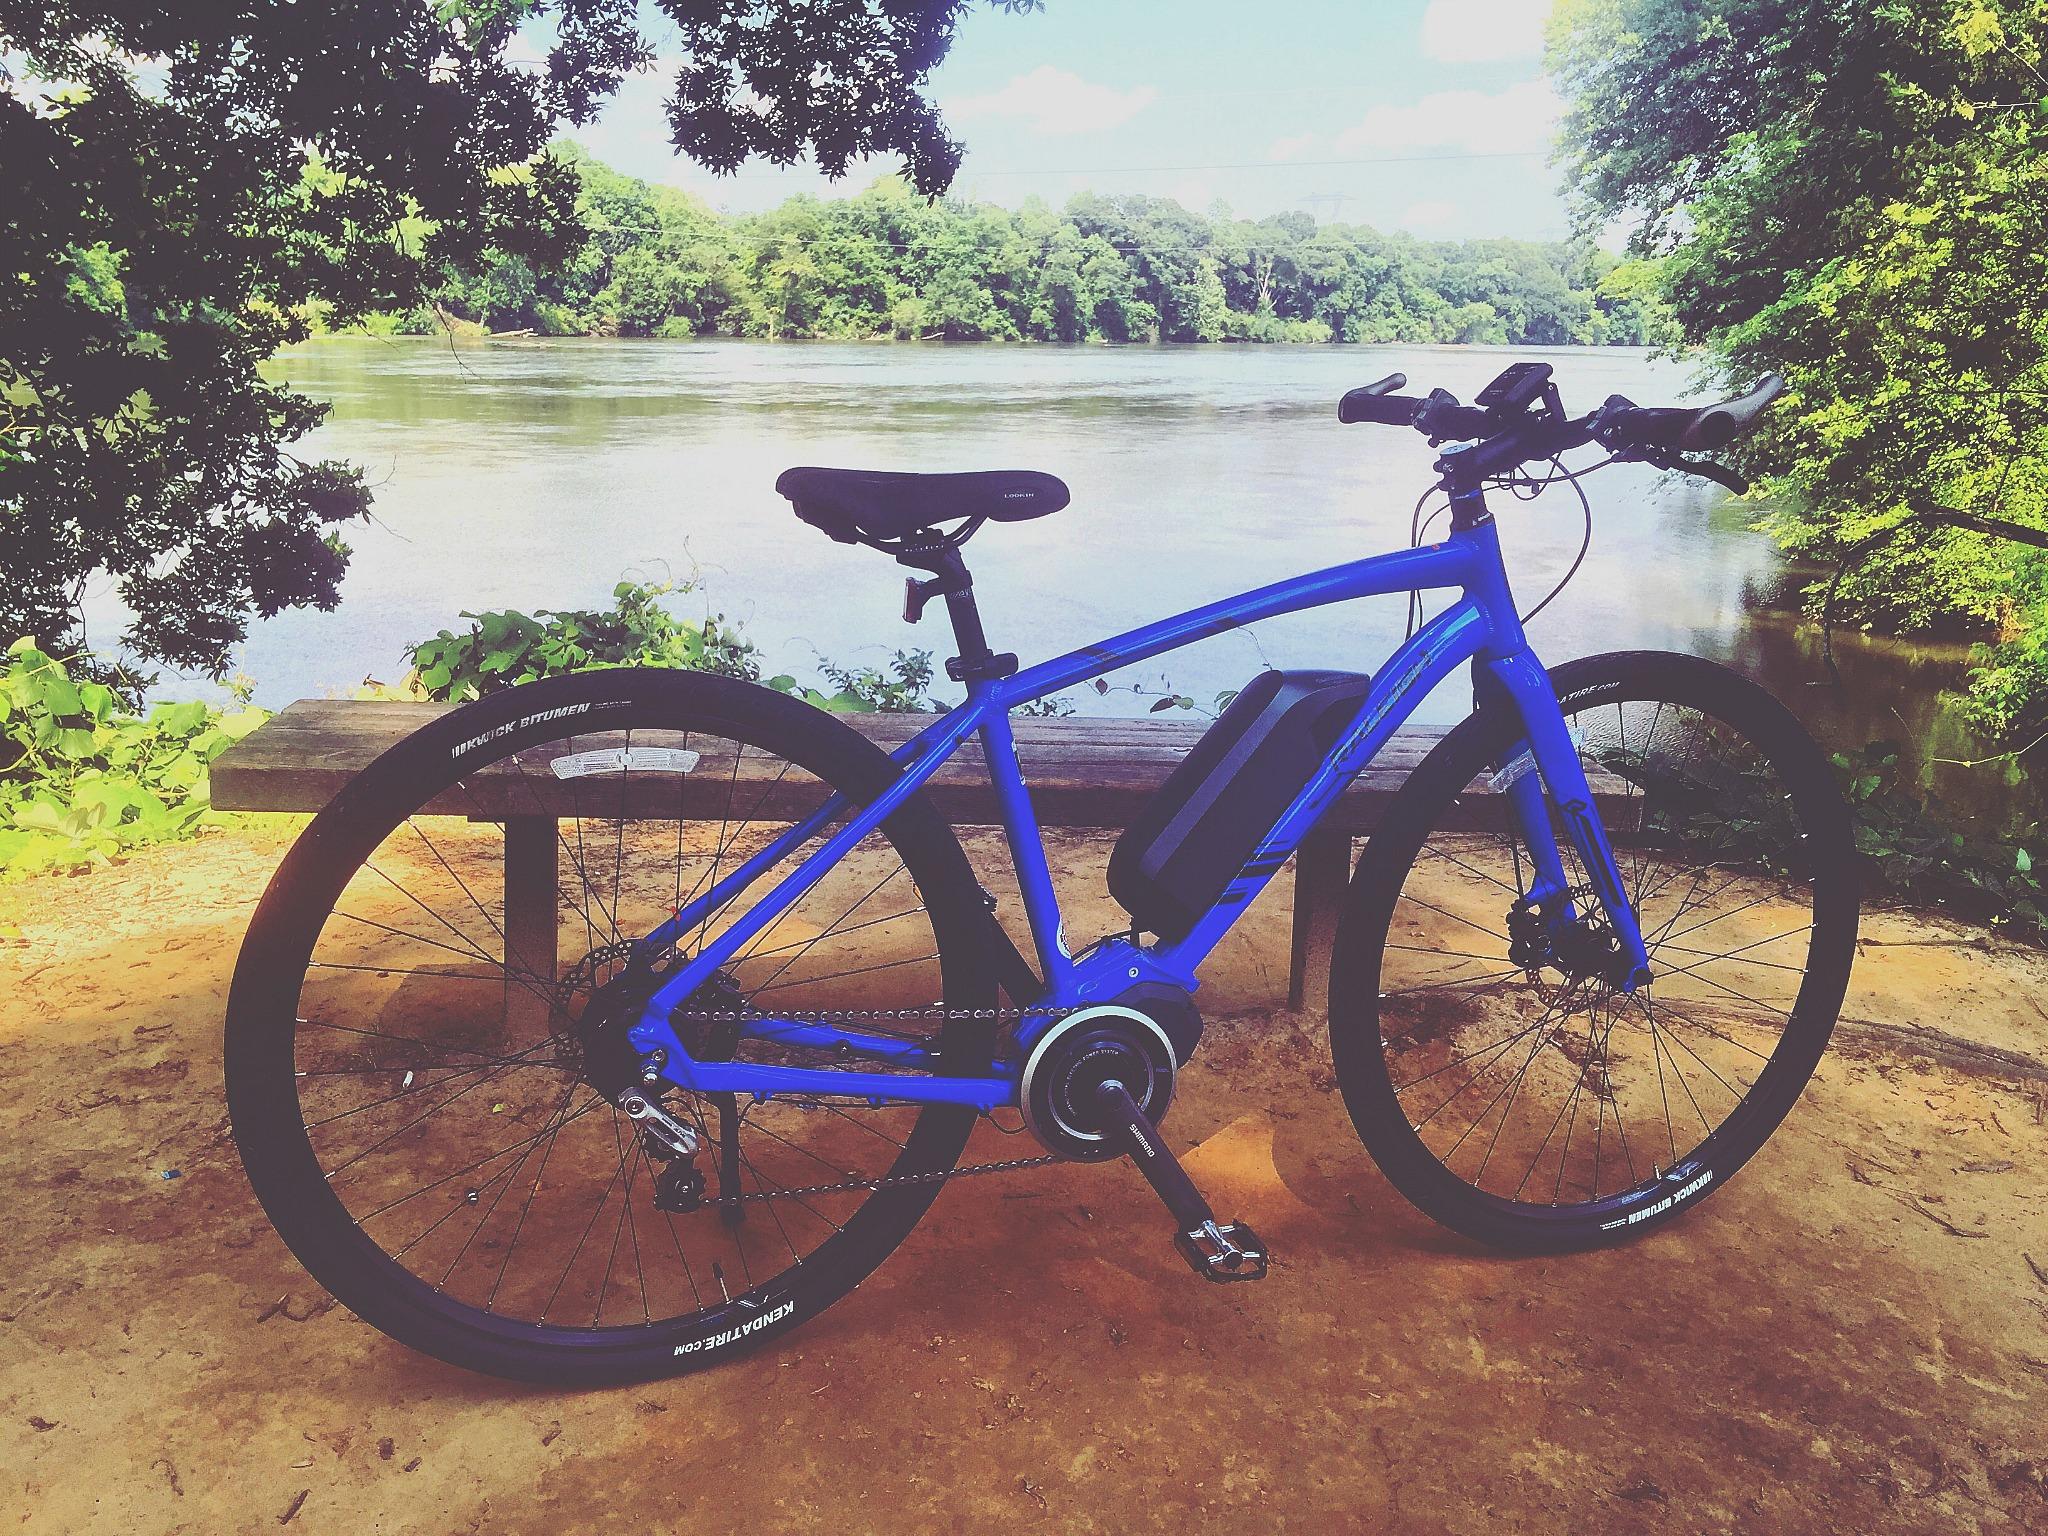 Biking Riverwalk Fort Mill SC, Catawba River